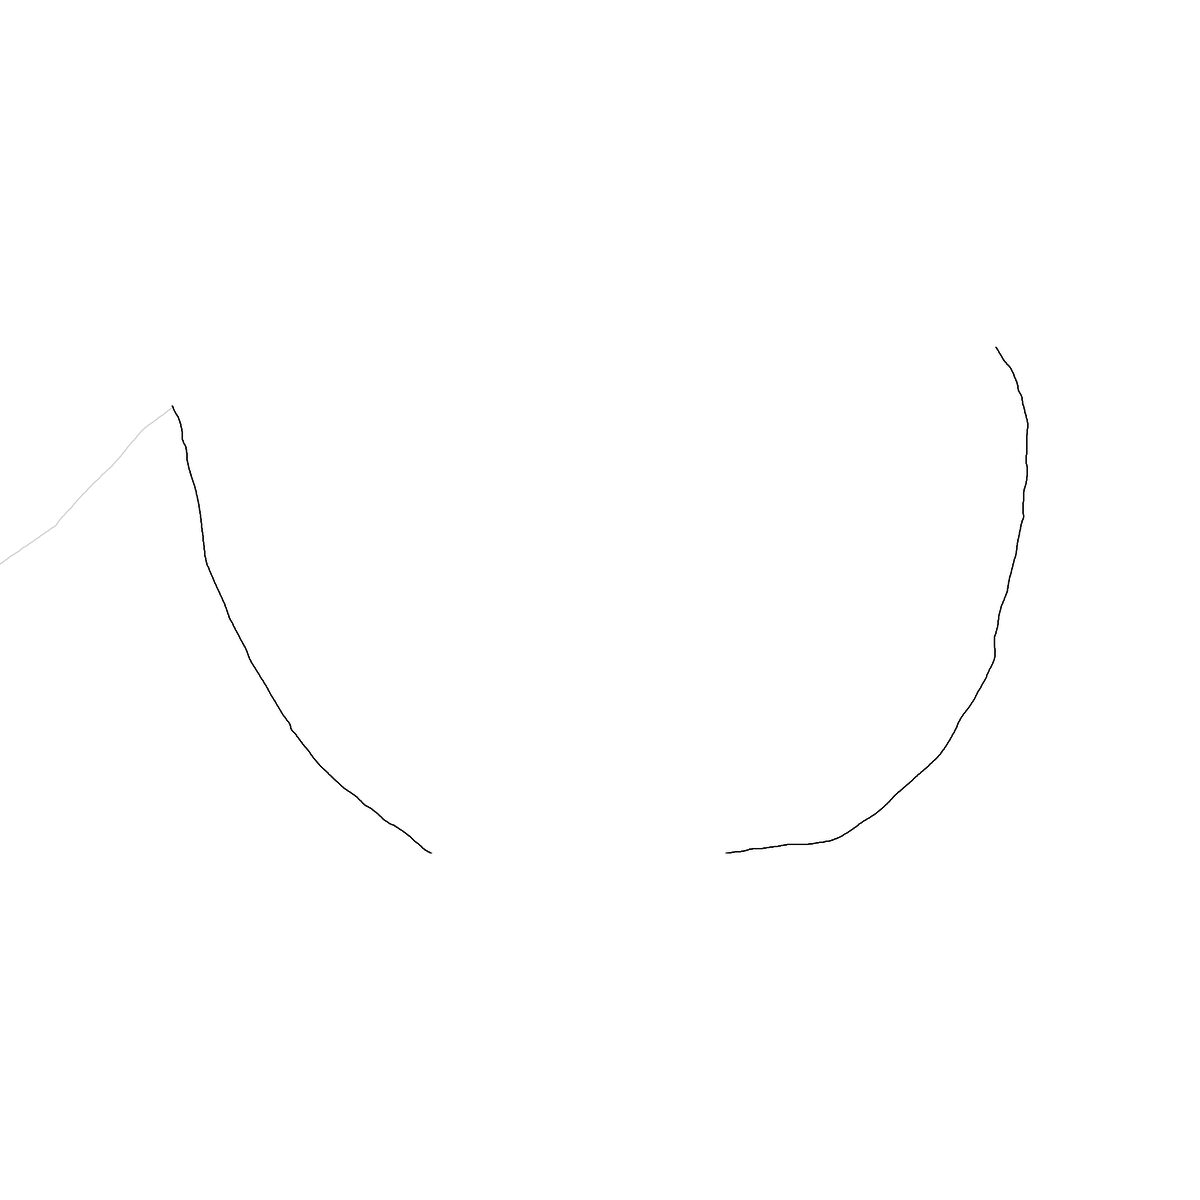 BAAAM drawing#16077 lat:39.0971221923828100lng: -84.5064086914062500